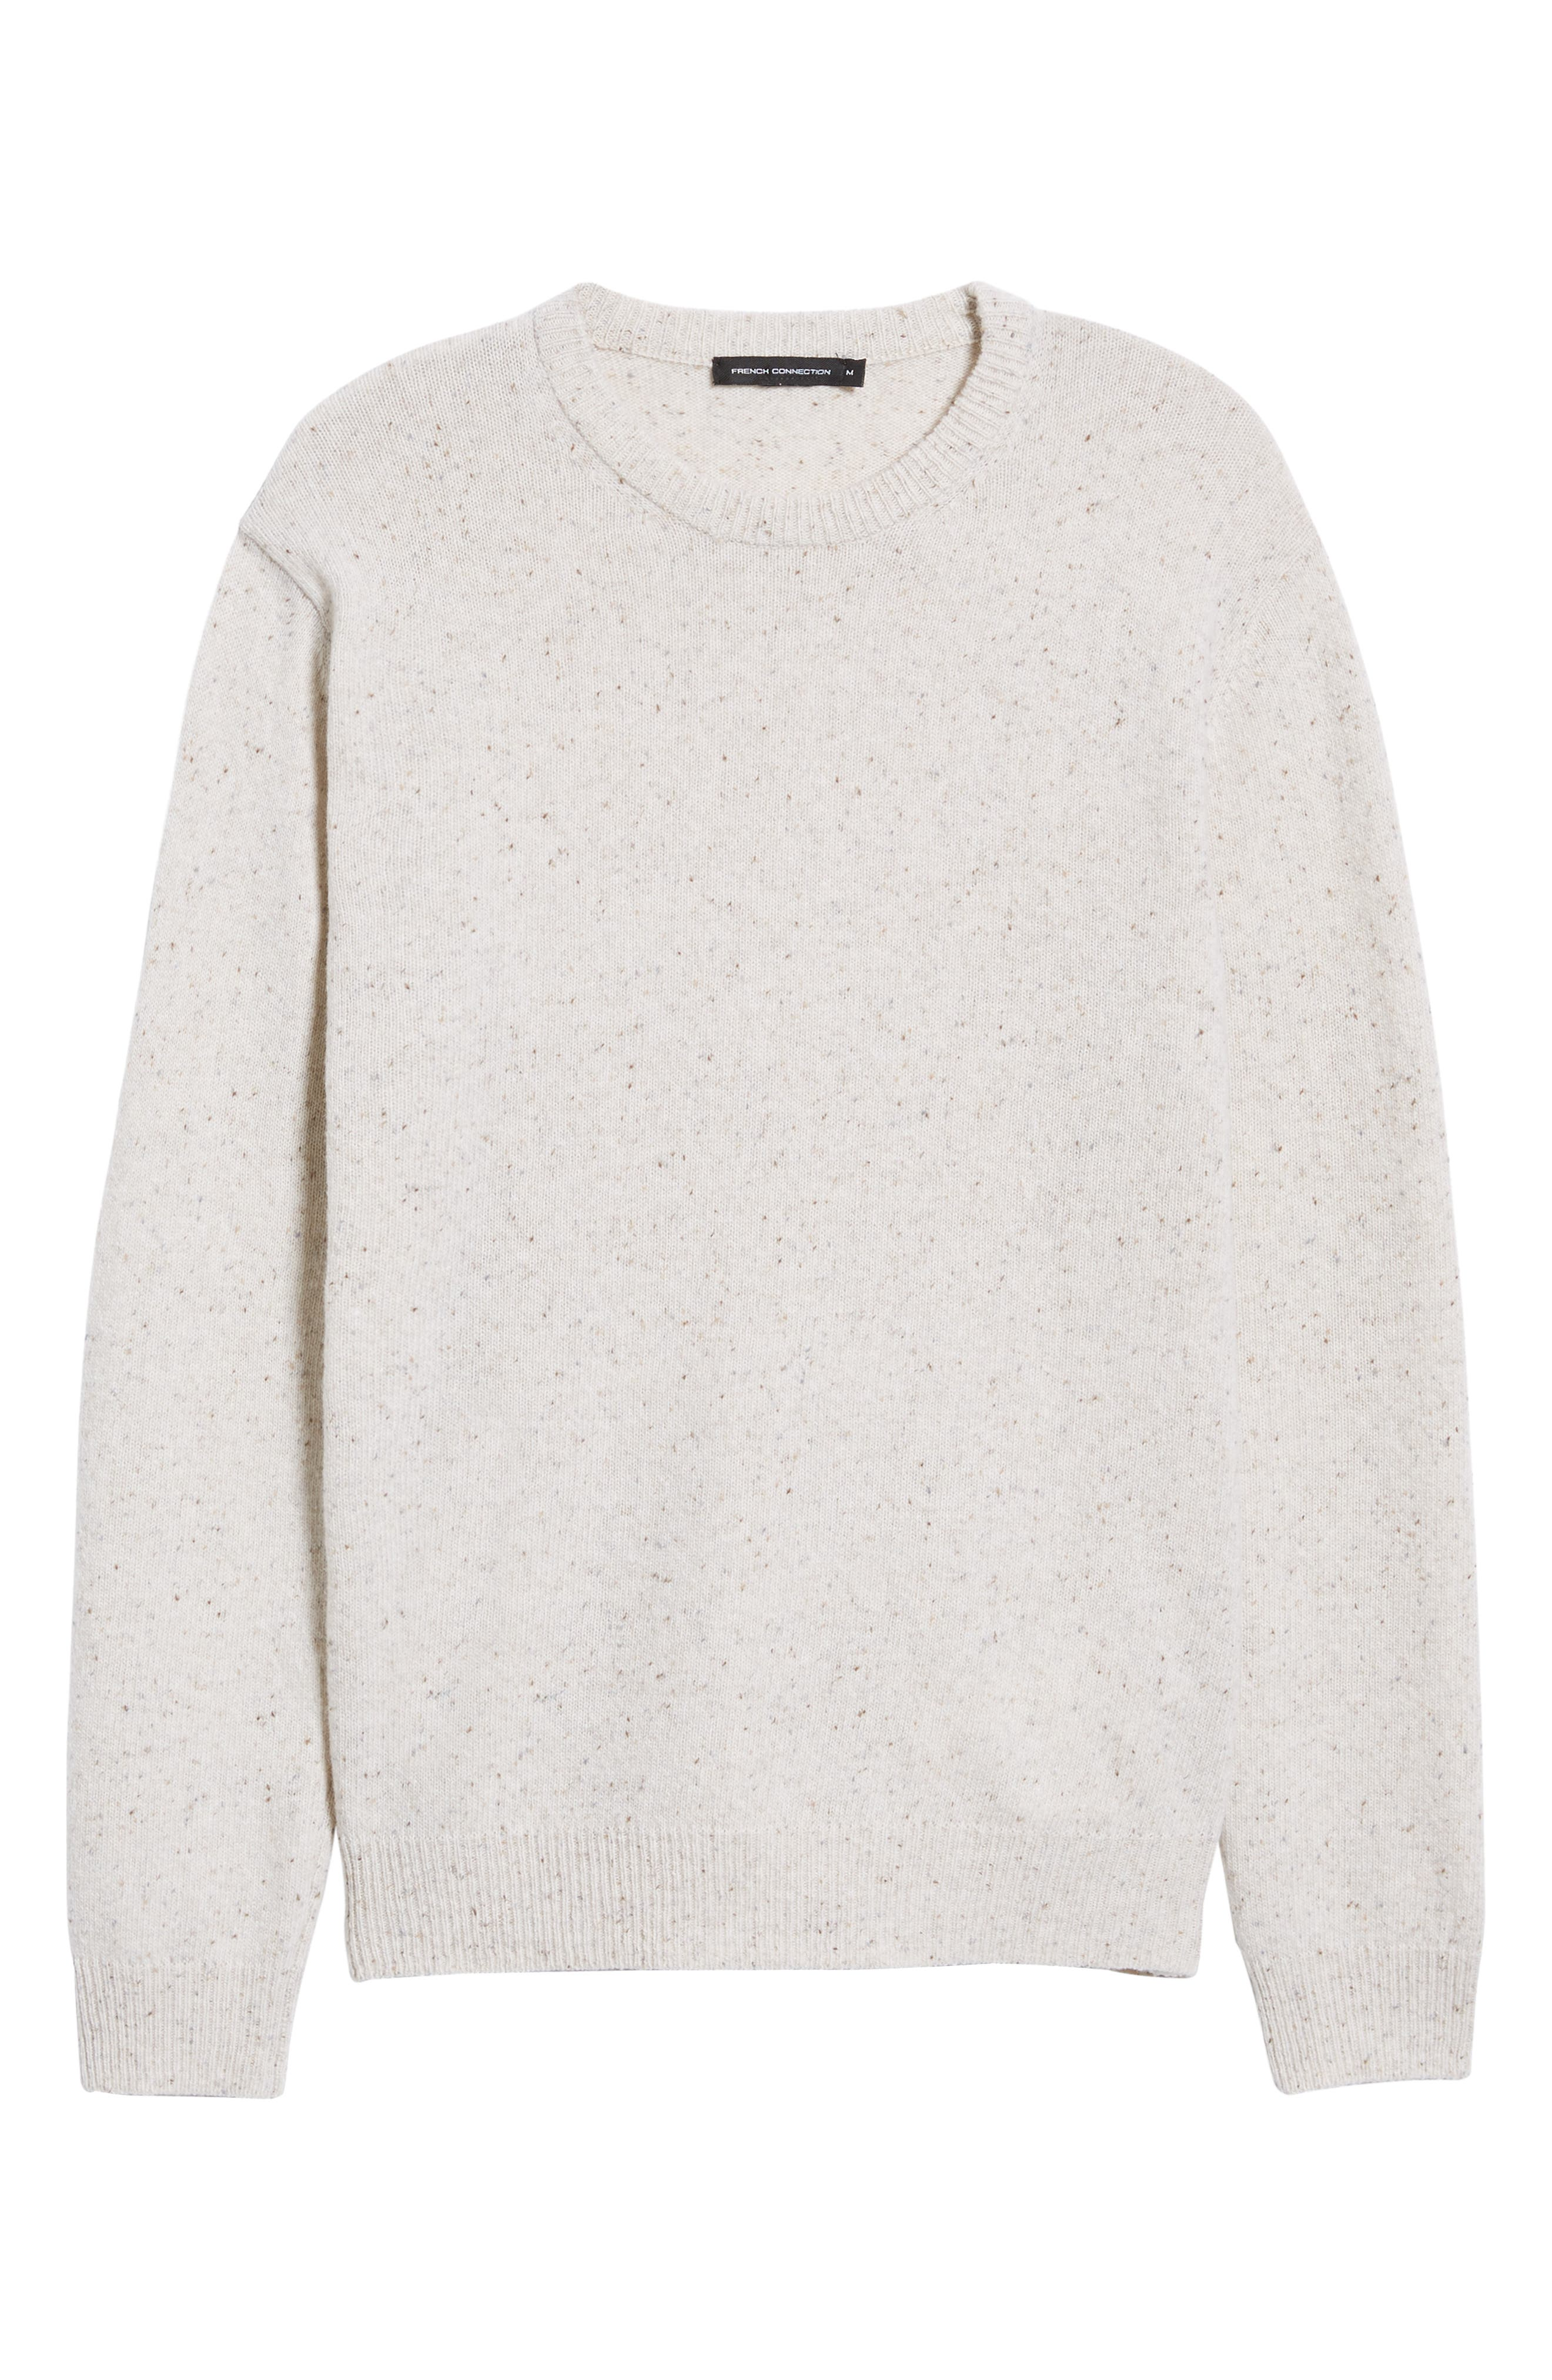 Donegal Sweater,                             Alternate thumbnail 6, color,                             CUBA WHITE